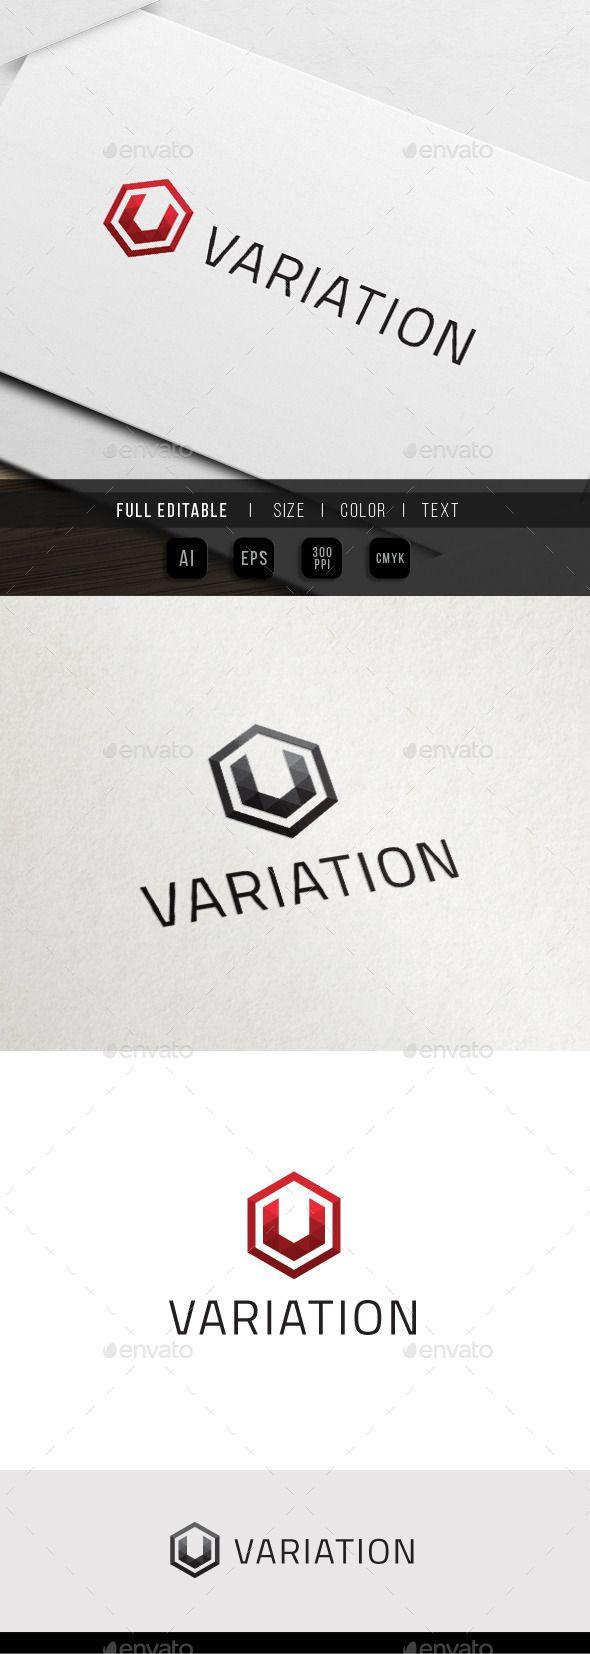 Hexa Variation Triangle Pixel V - Logo Design Template Vector #logotype Download…